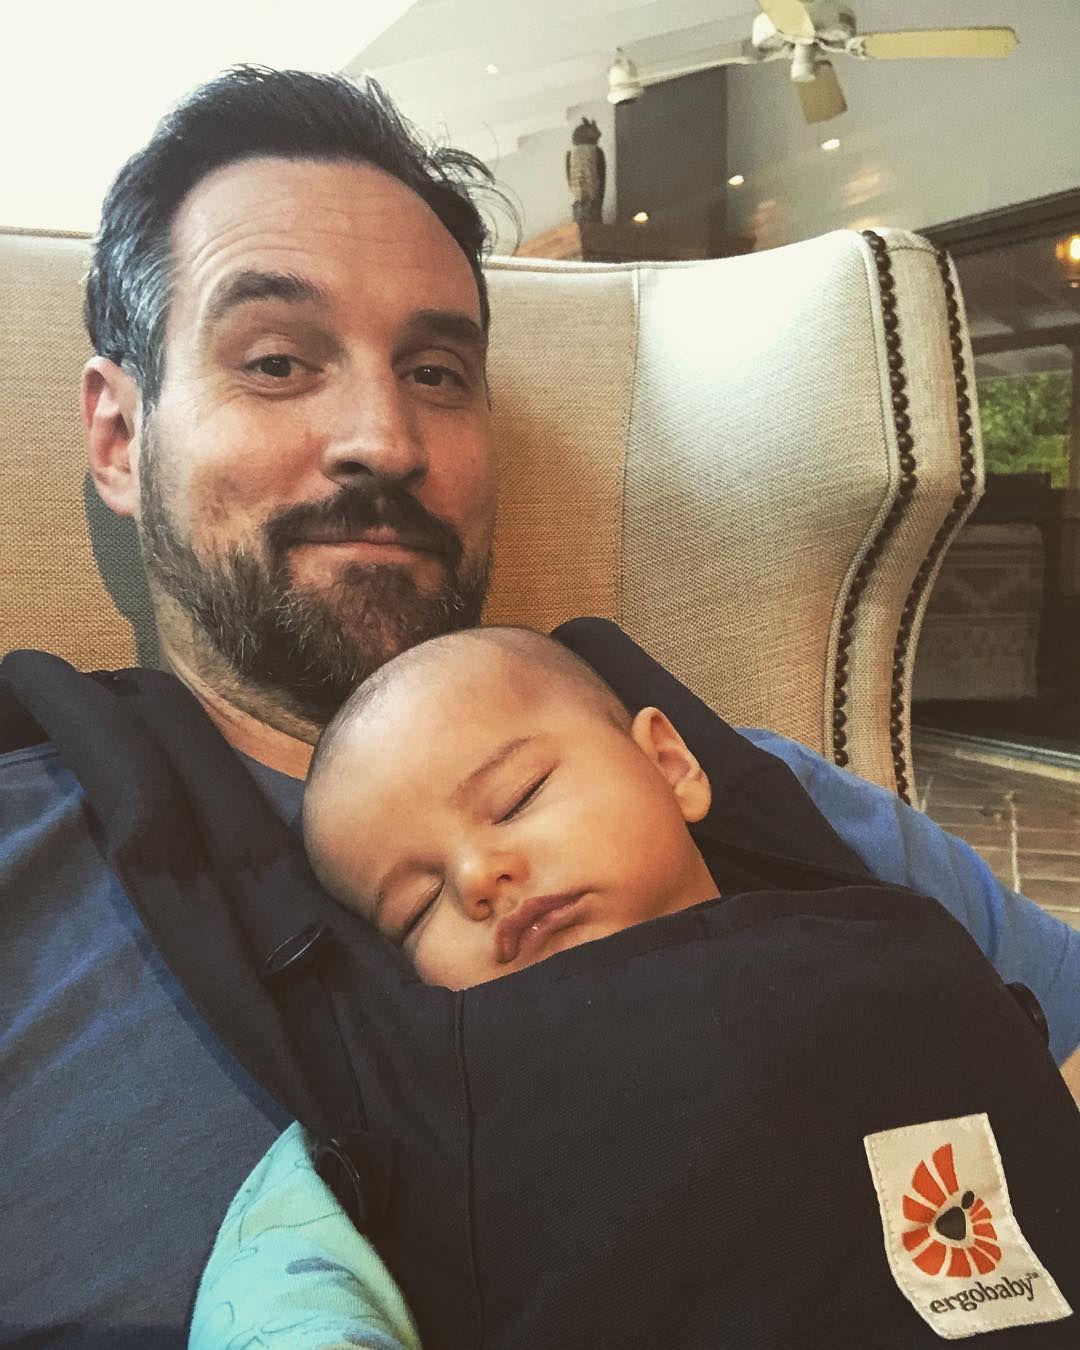 Photo of Travis Willingham & his Son Ronin Willingham